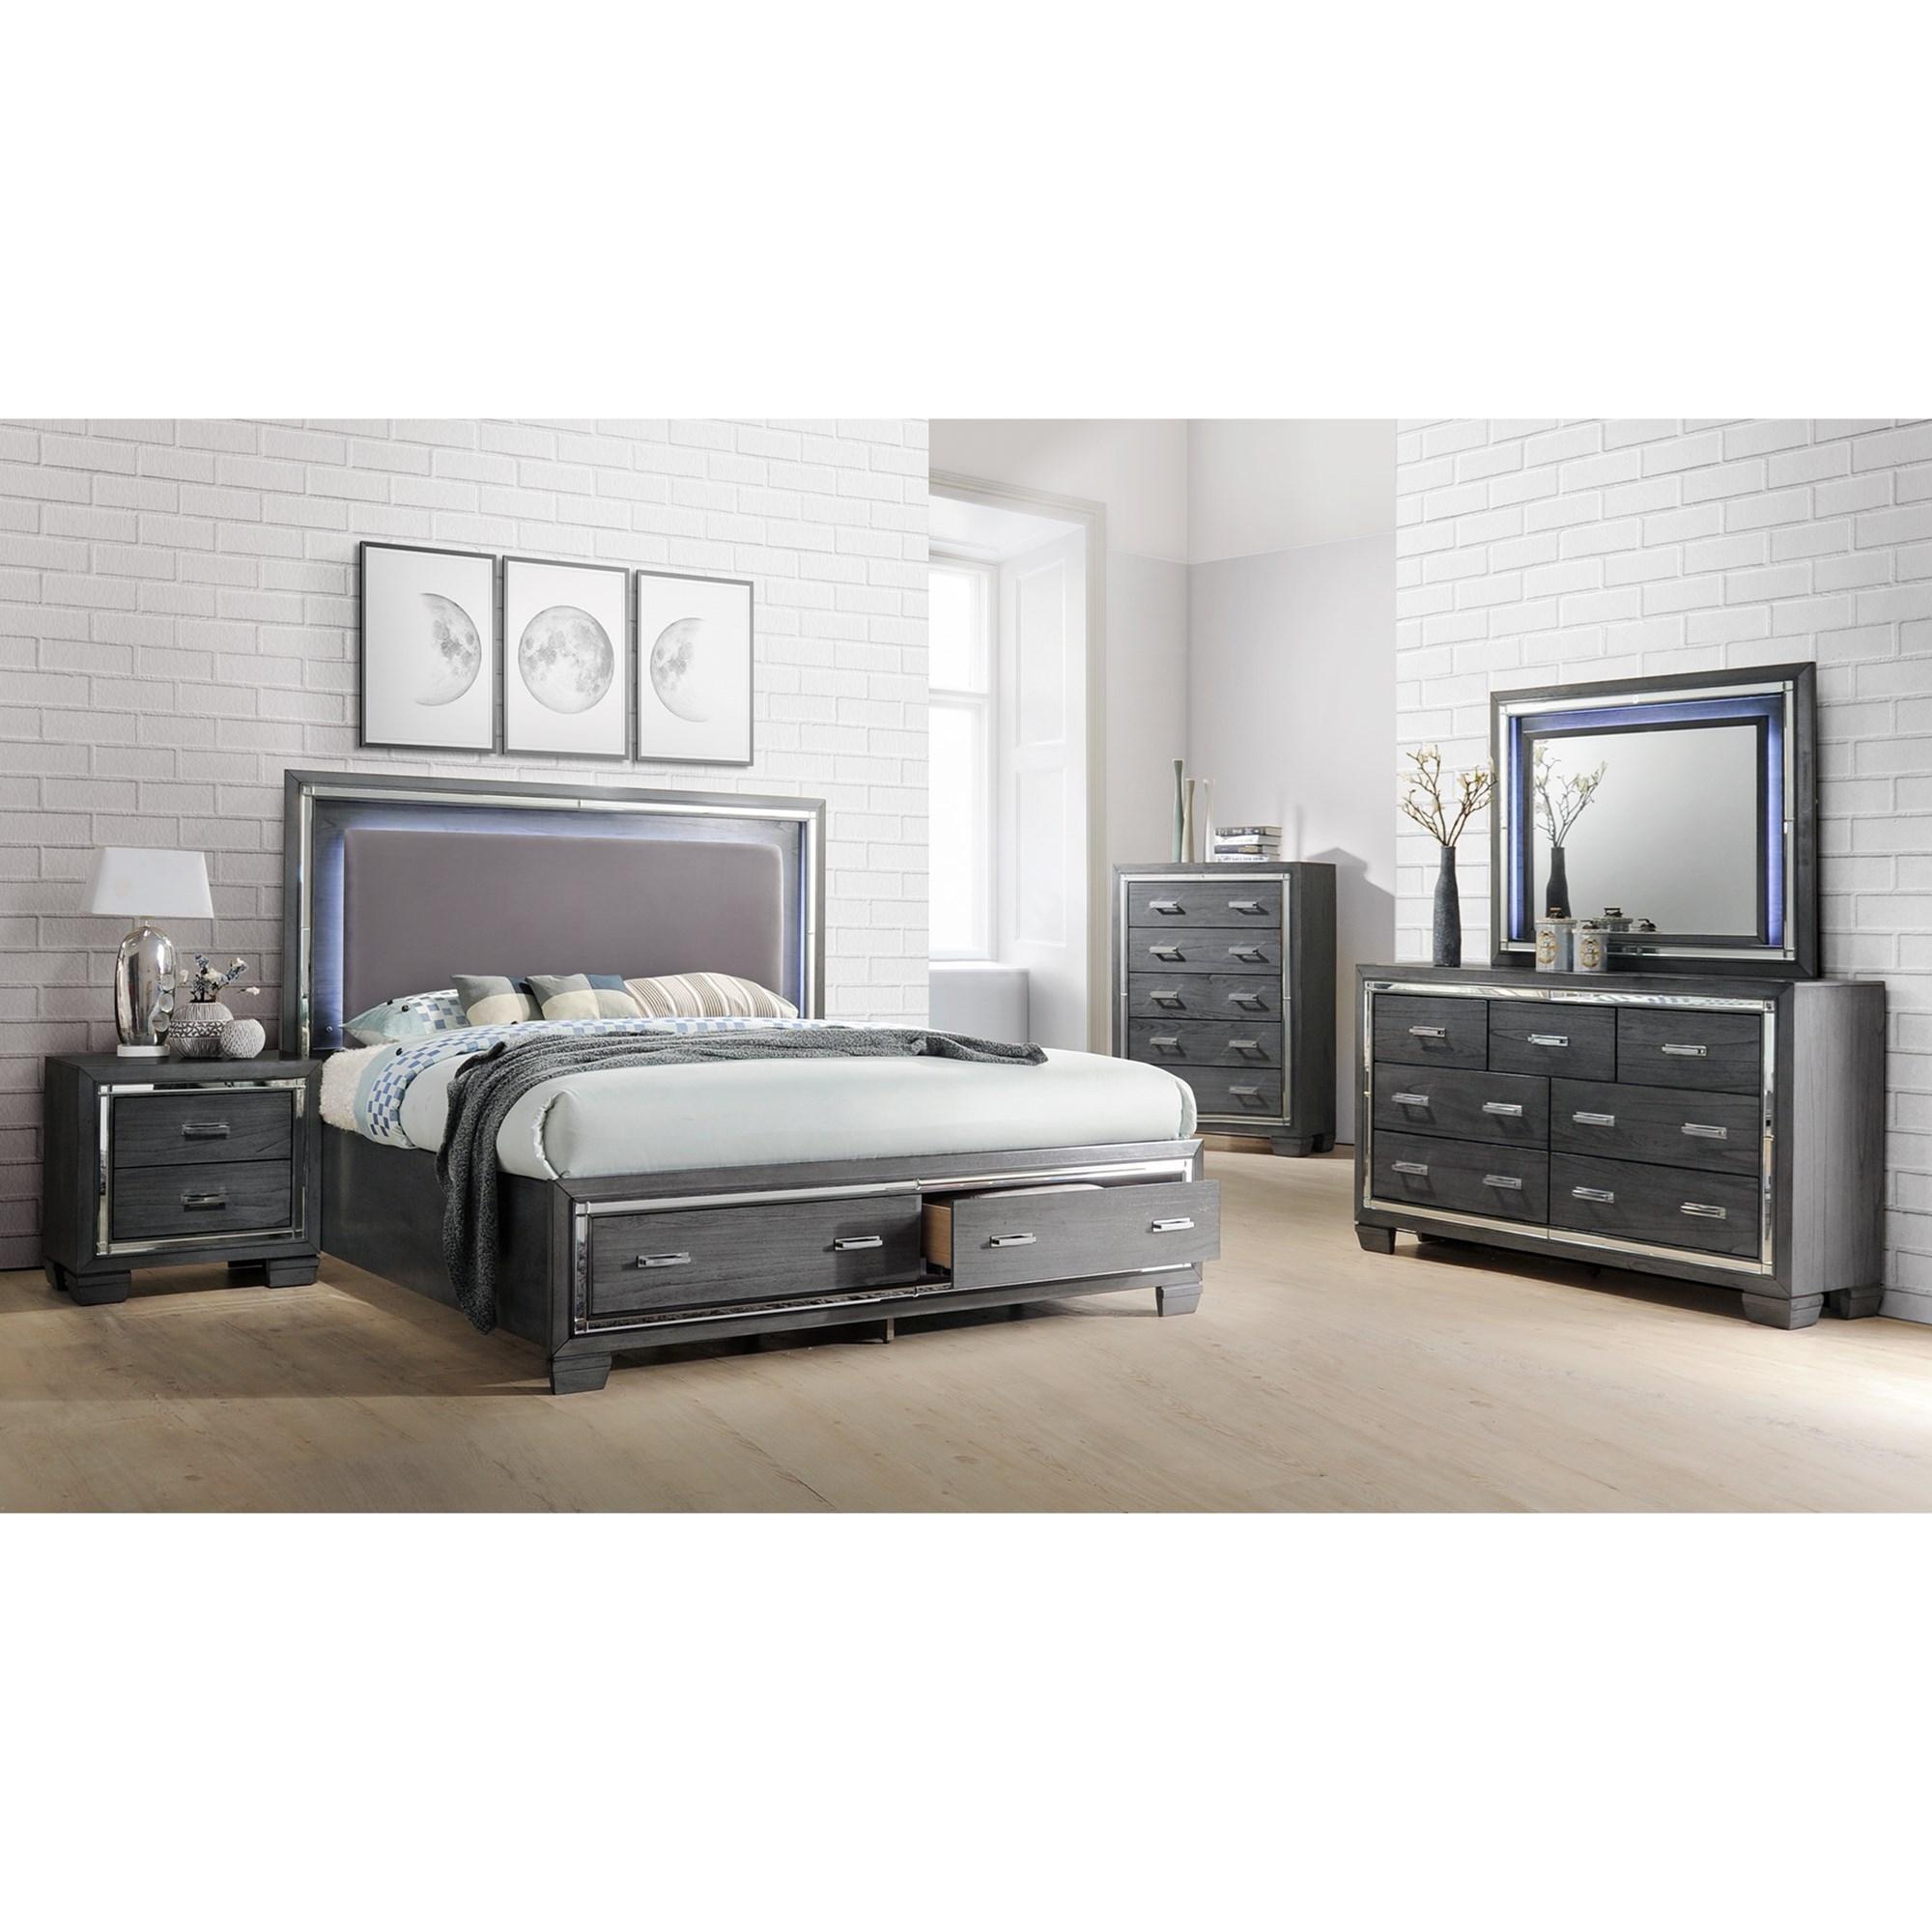 5-Piece King Bedroom Group